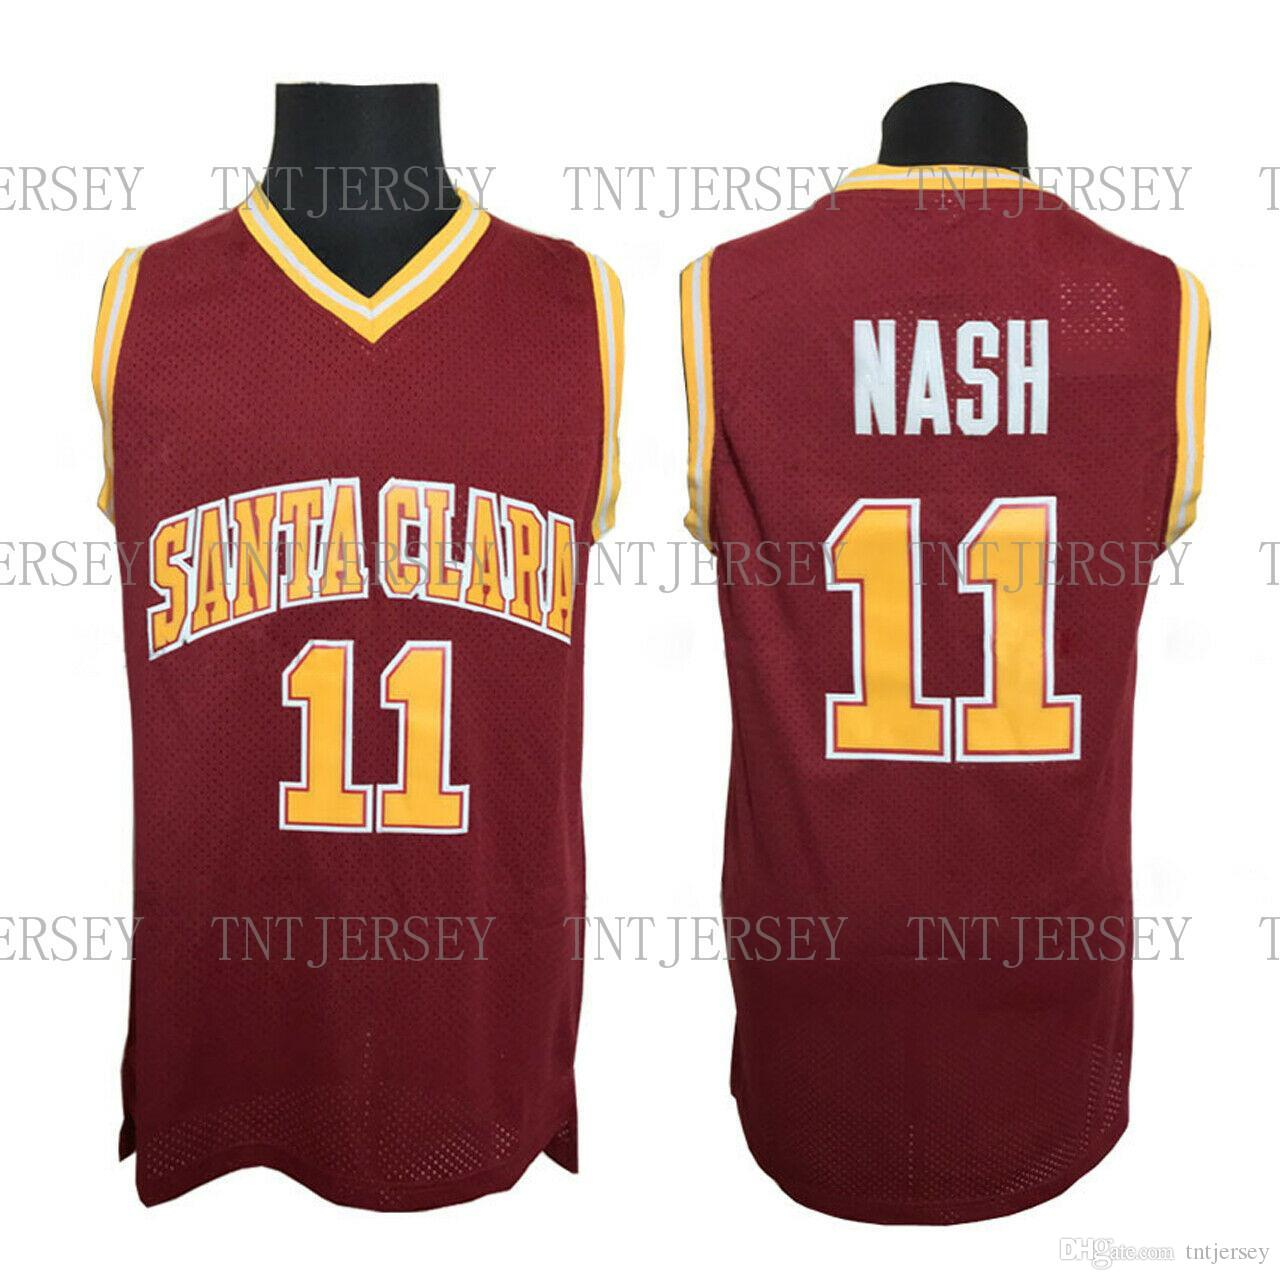 , Steve Nash # 11 Santa Clara Koleji Basketbol Formalar Dikişli Boyut S-XXL Ücretsiz Kargo